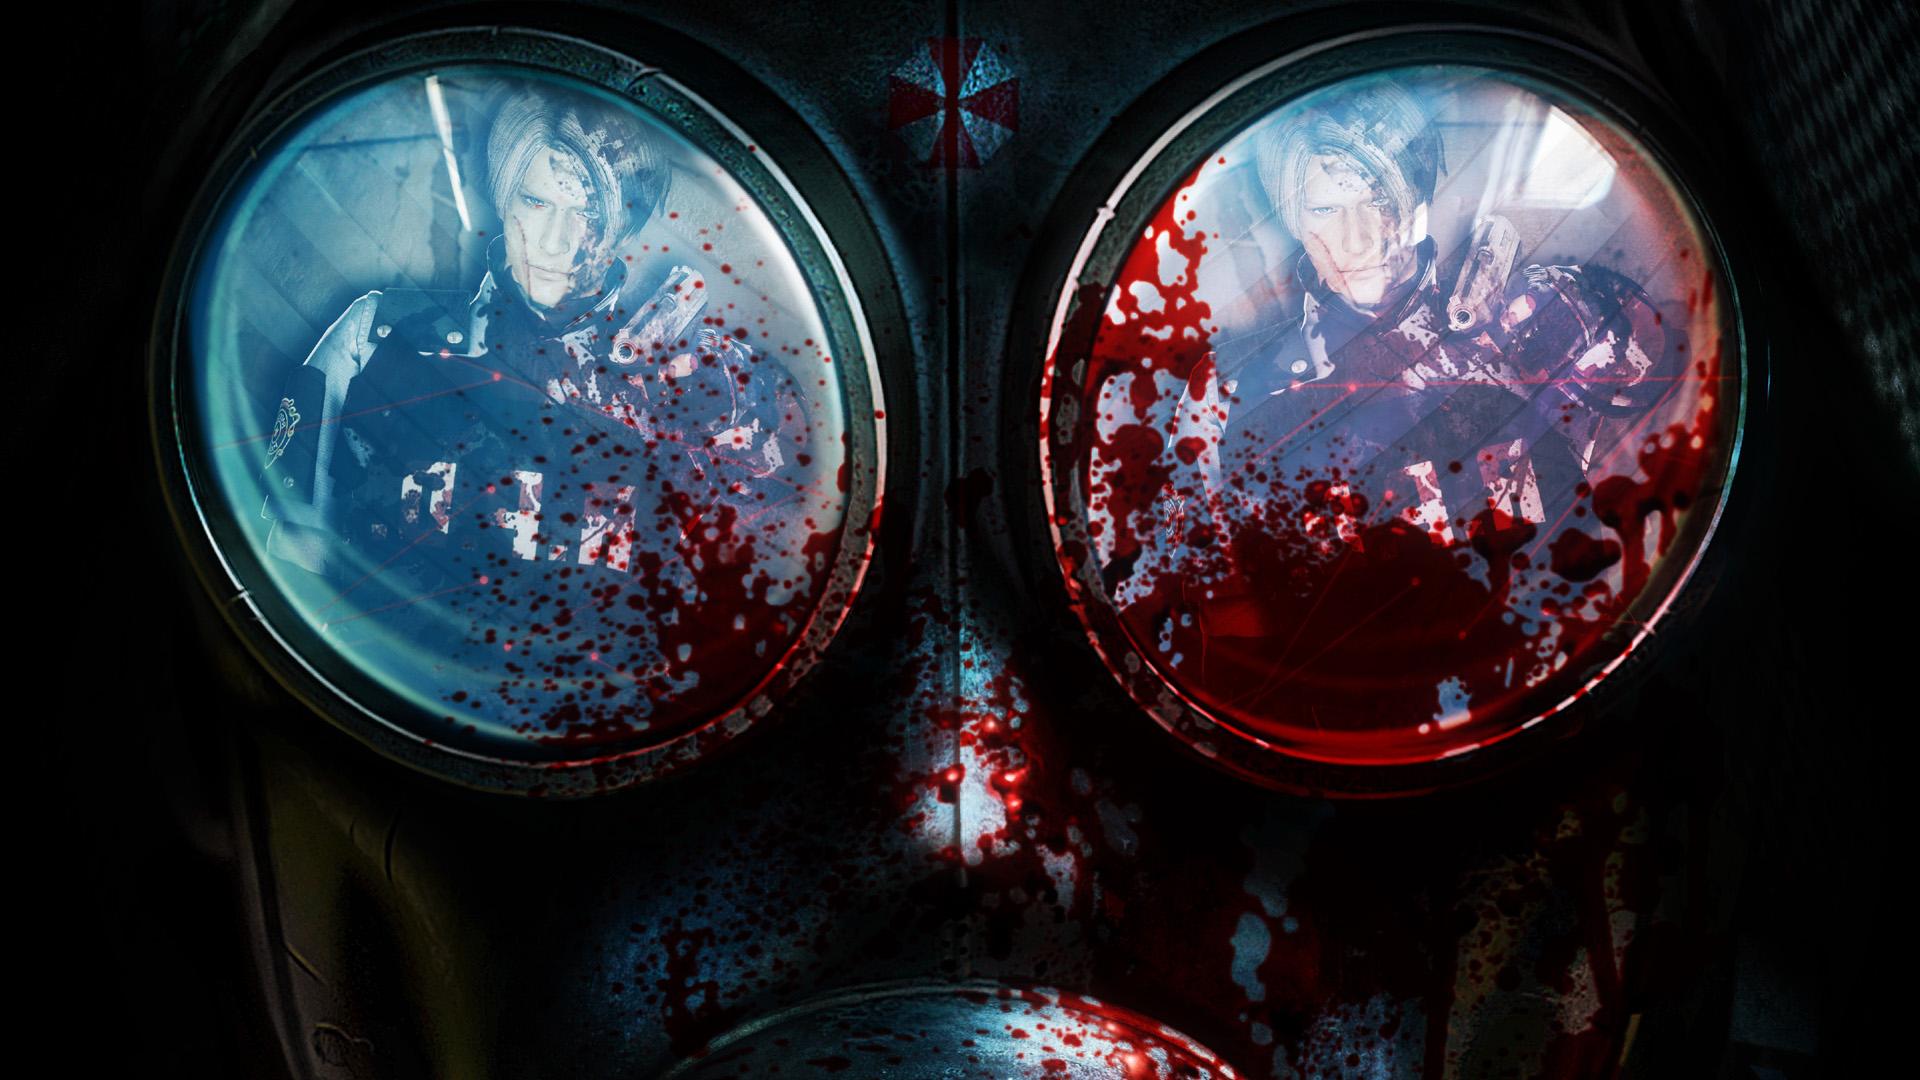 Hd wallpaper resident evil - Video Game Resident Evil Operation Raccoon City Wallpaper